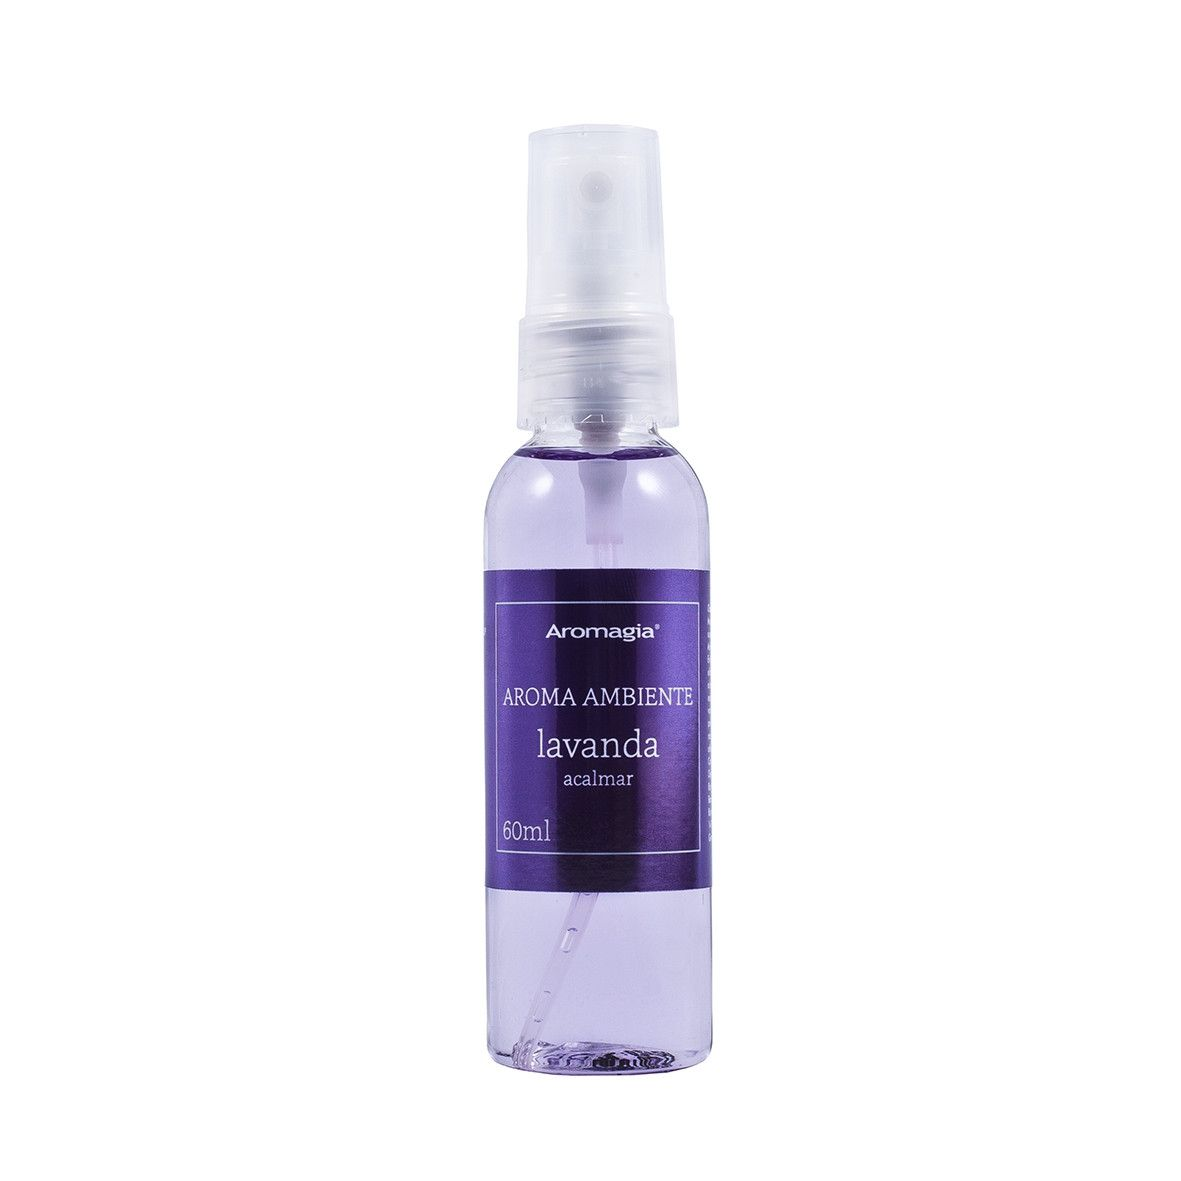 Spray de Ambiente Aromagia - Lavanda 60ml - WNF